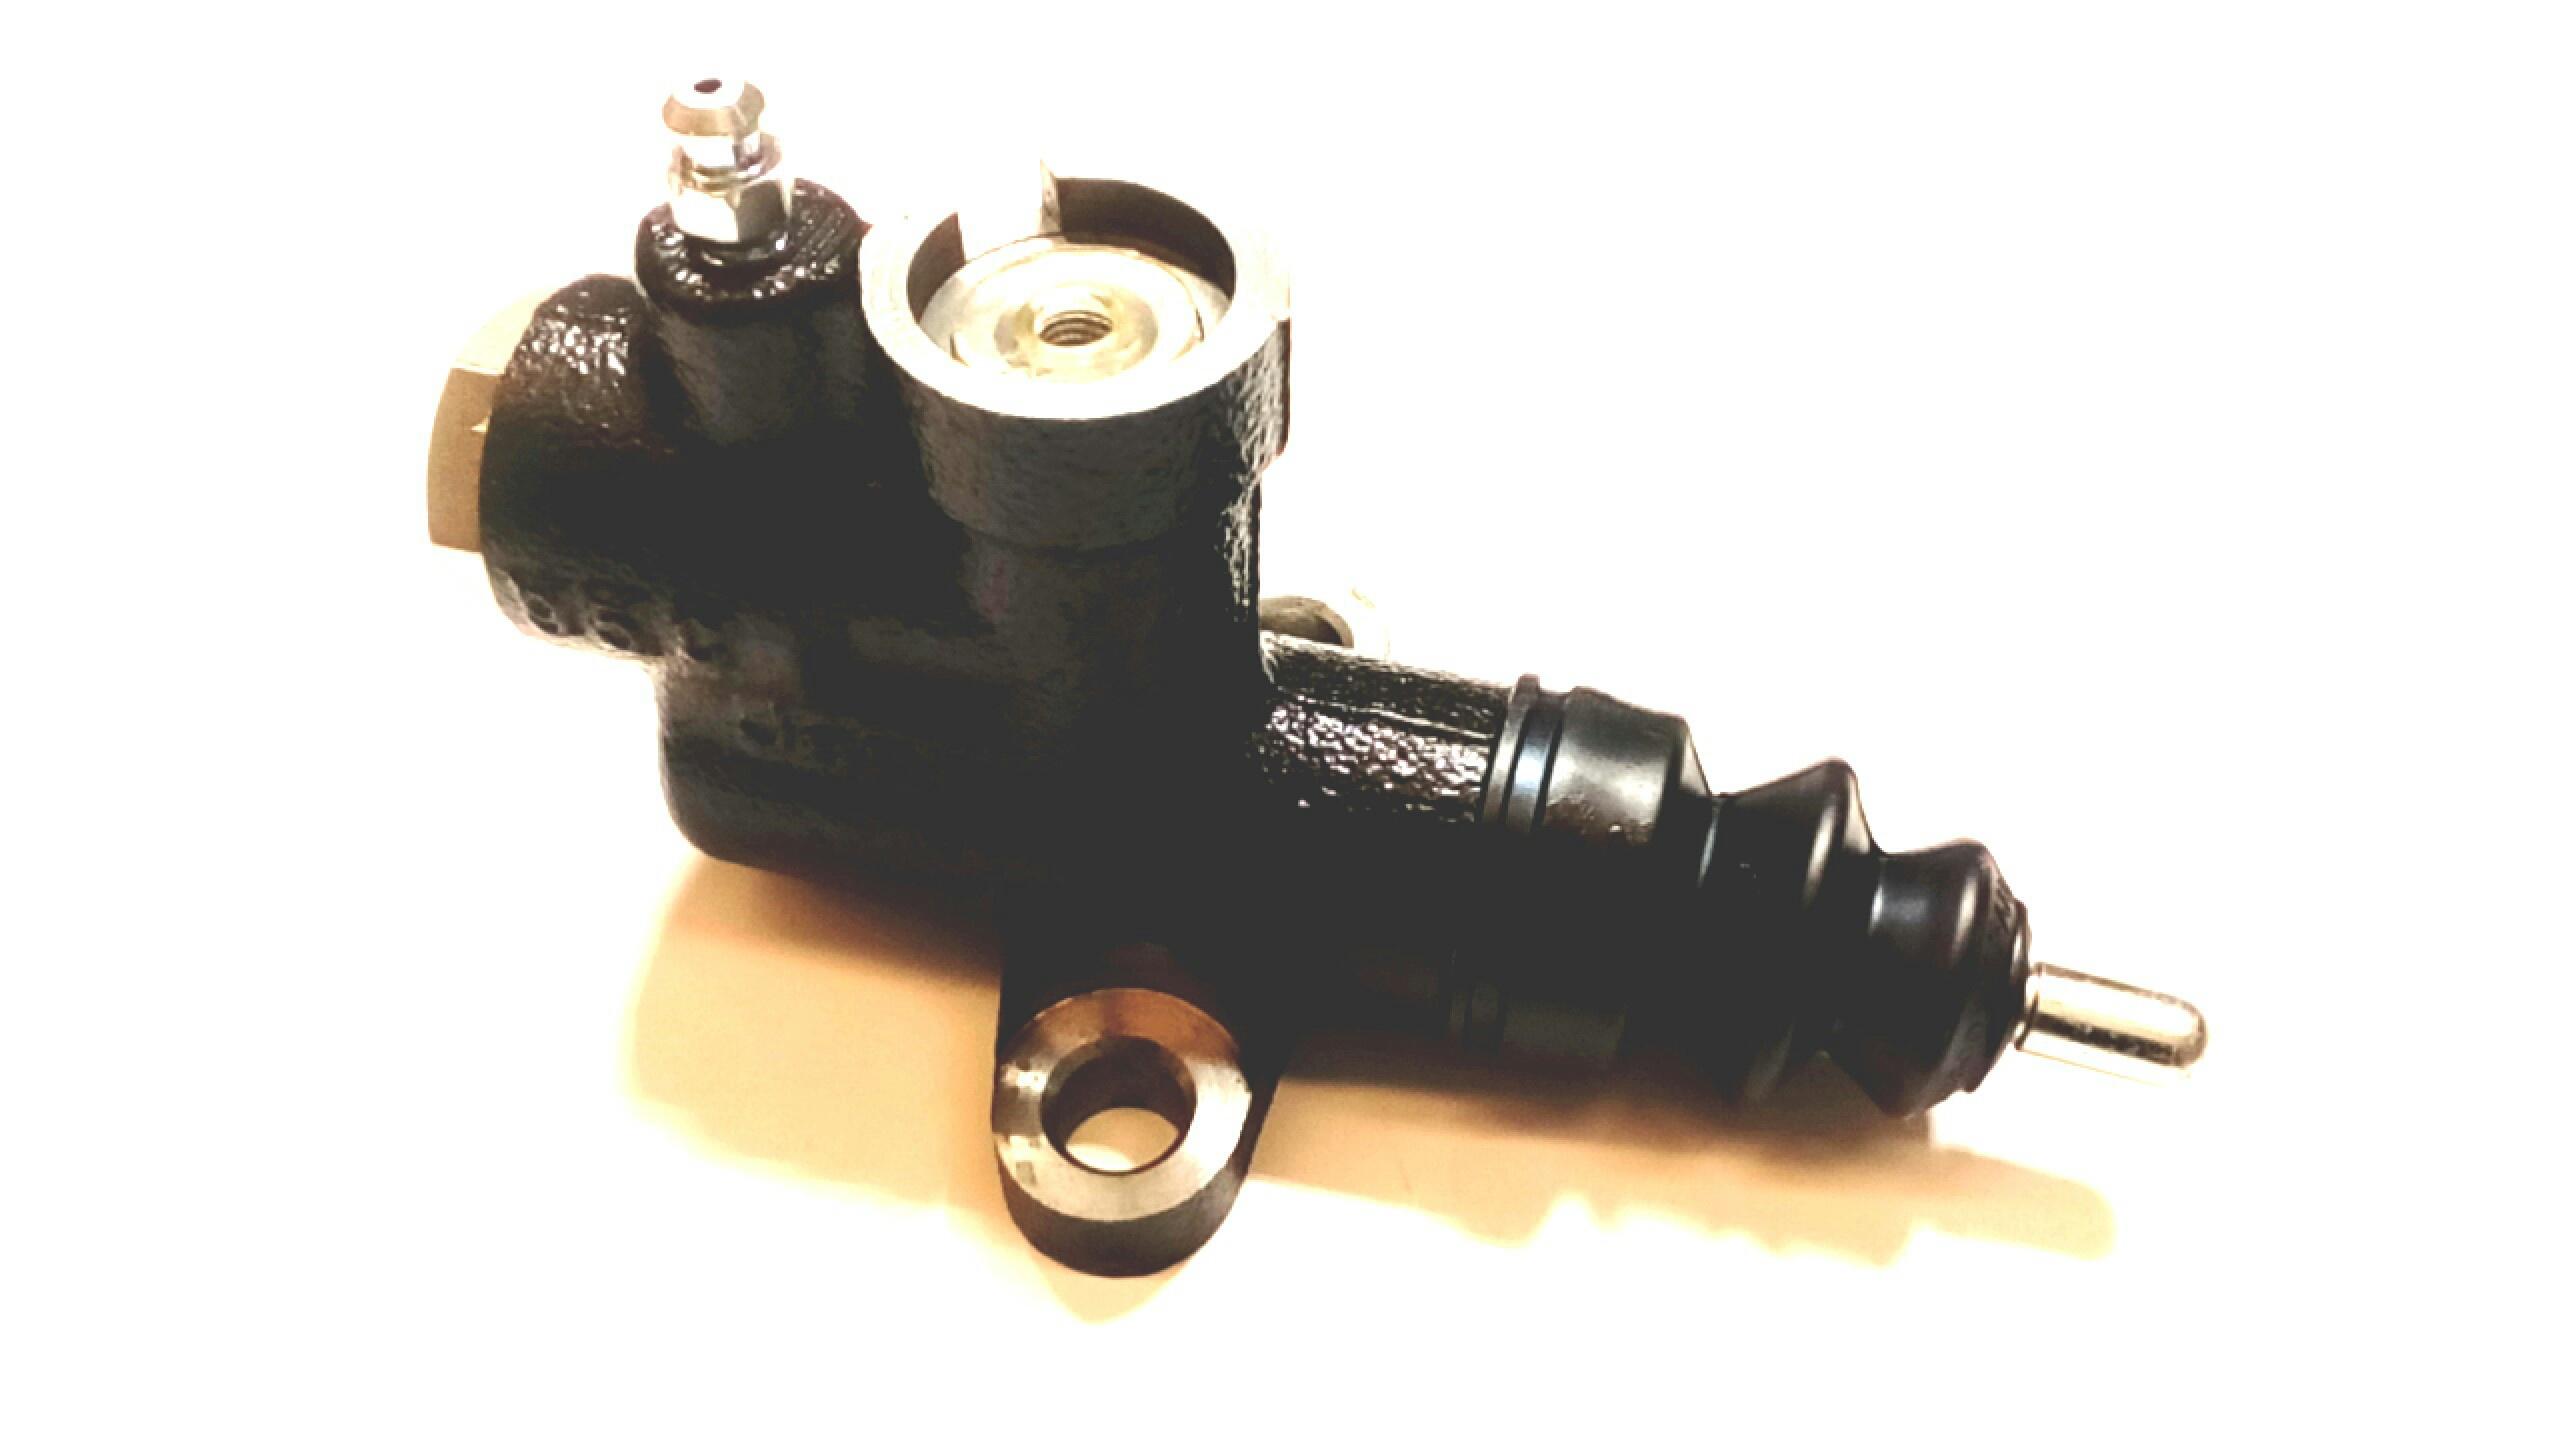 2006 Subaru Legacy Cylinder Assembly